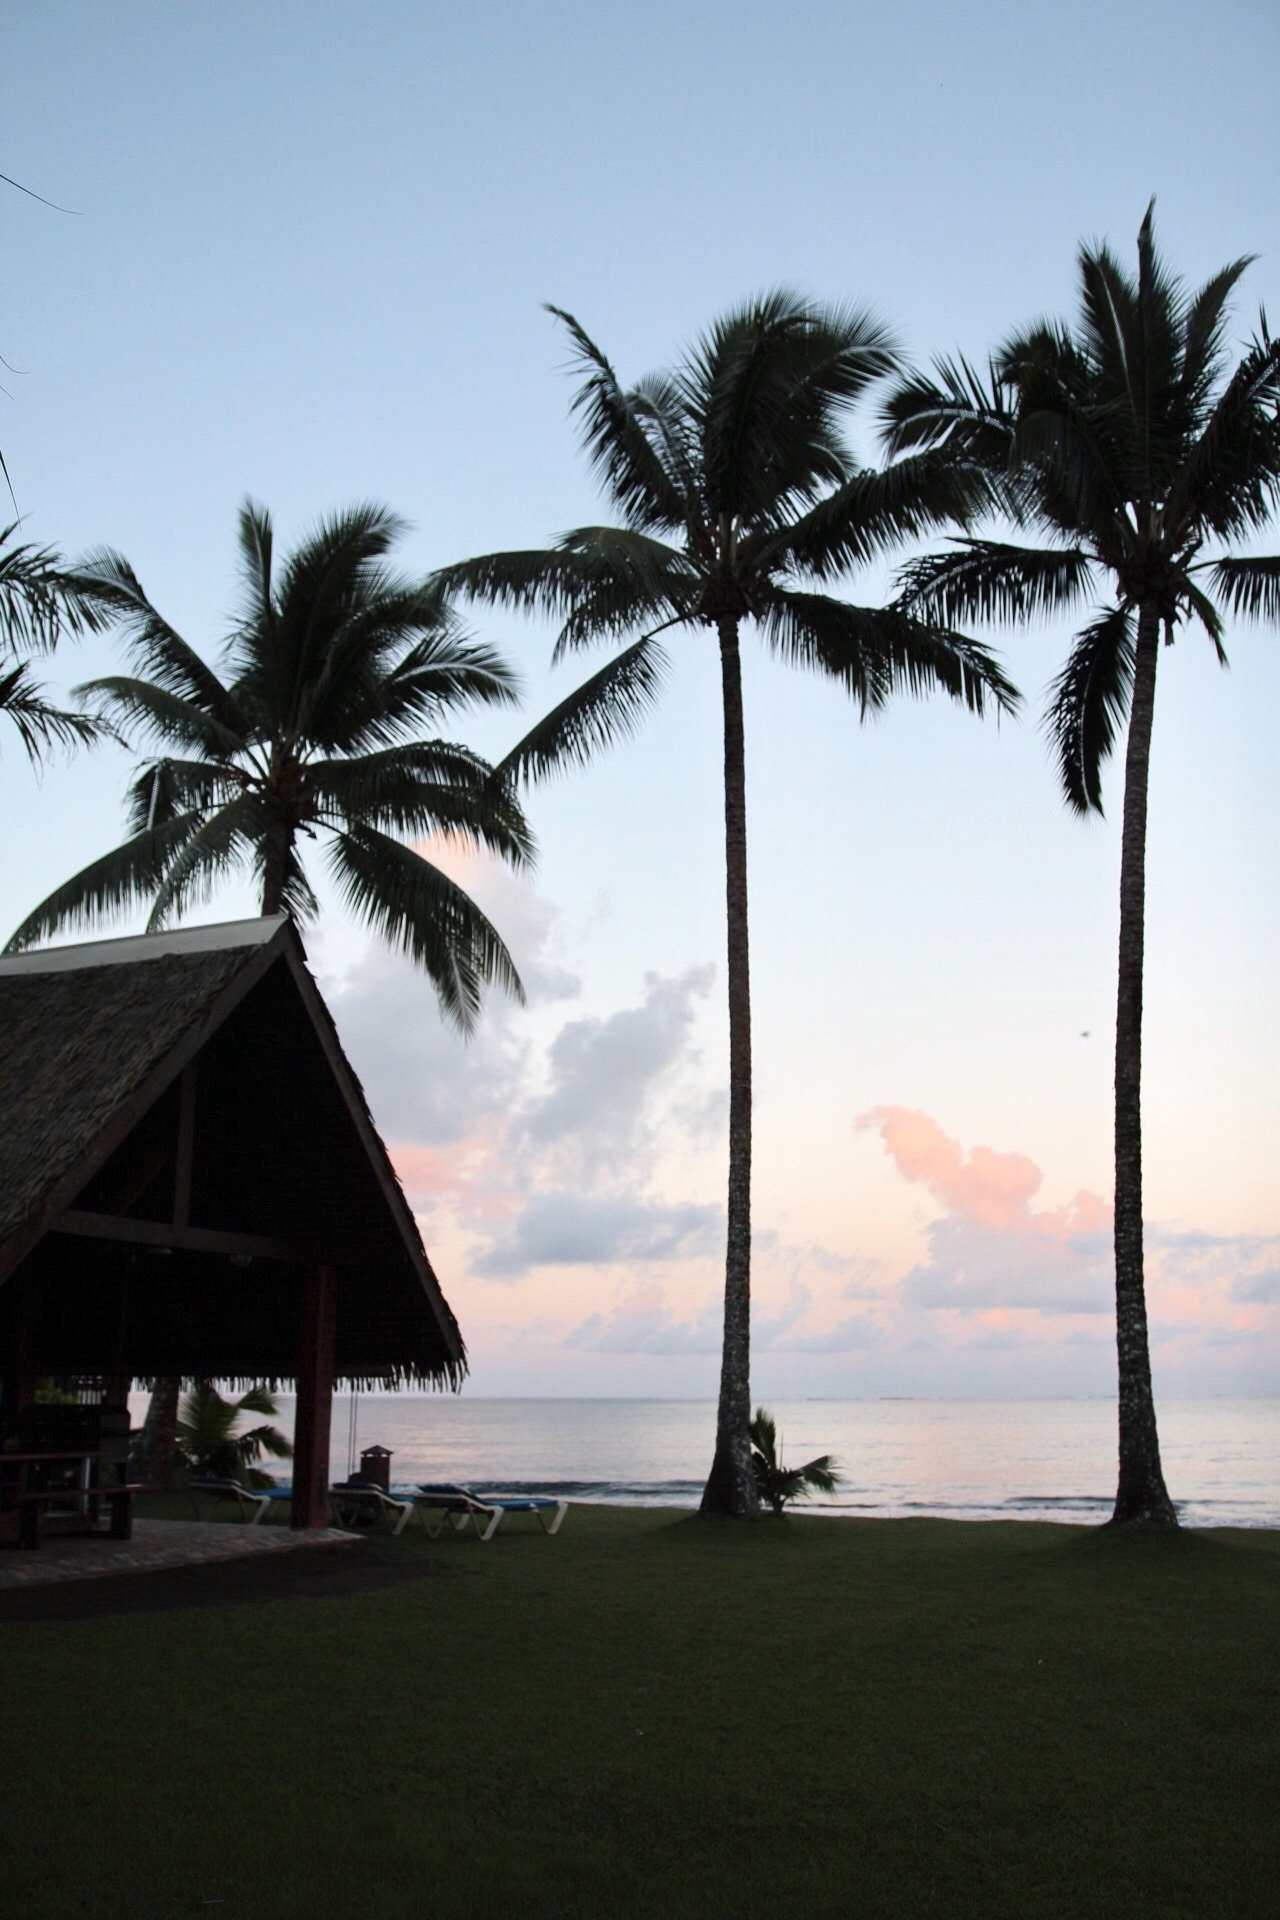 Hilton pää saari dating